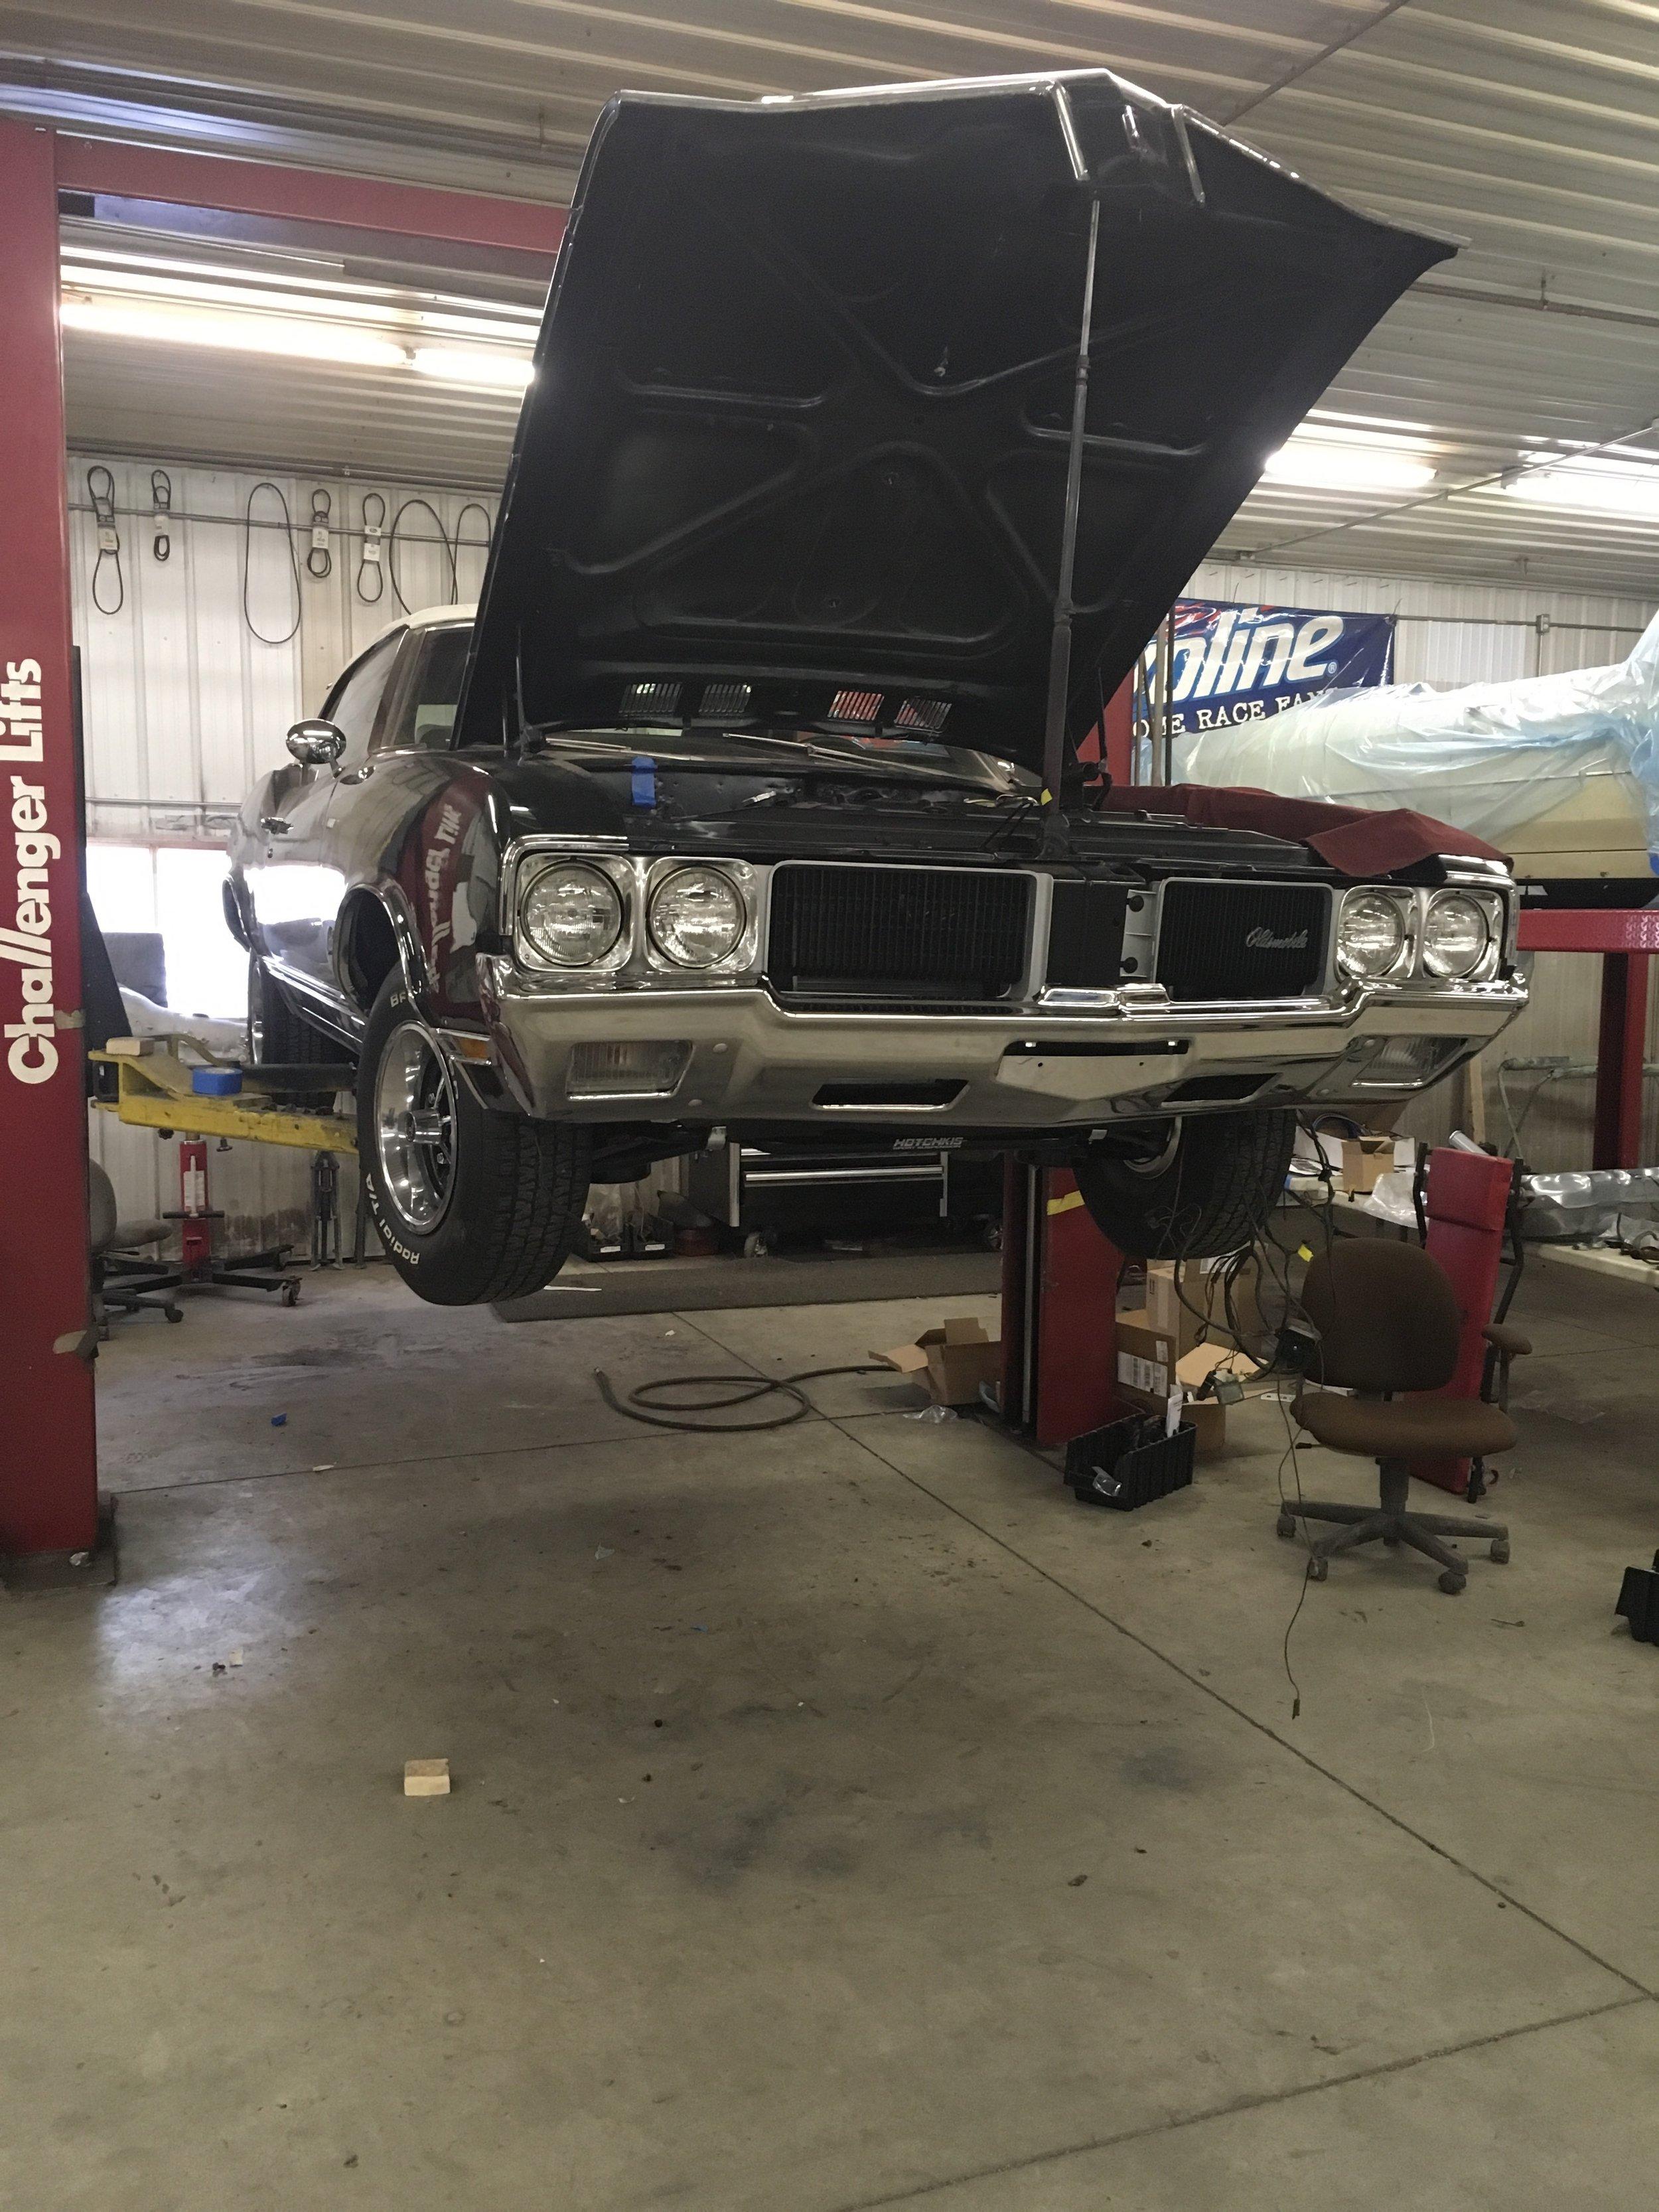 70-oldsmobile-cutlass-minneapolis-custom-hot-rod-car-restoration-1.jpg